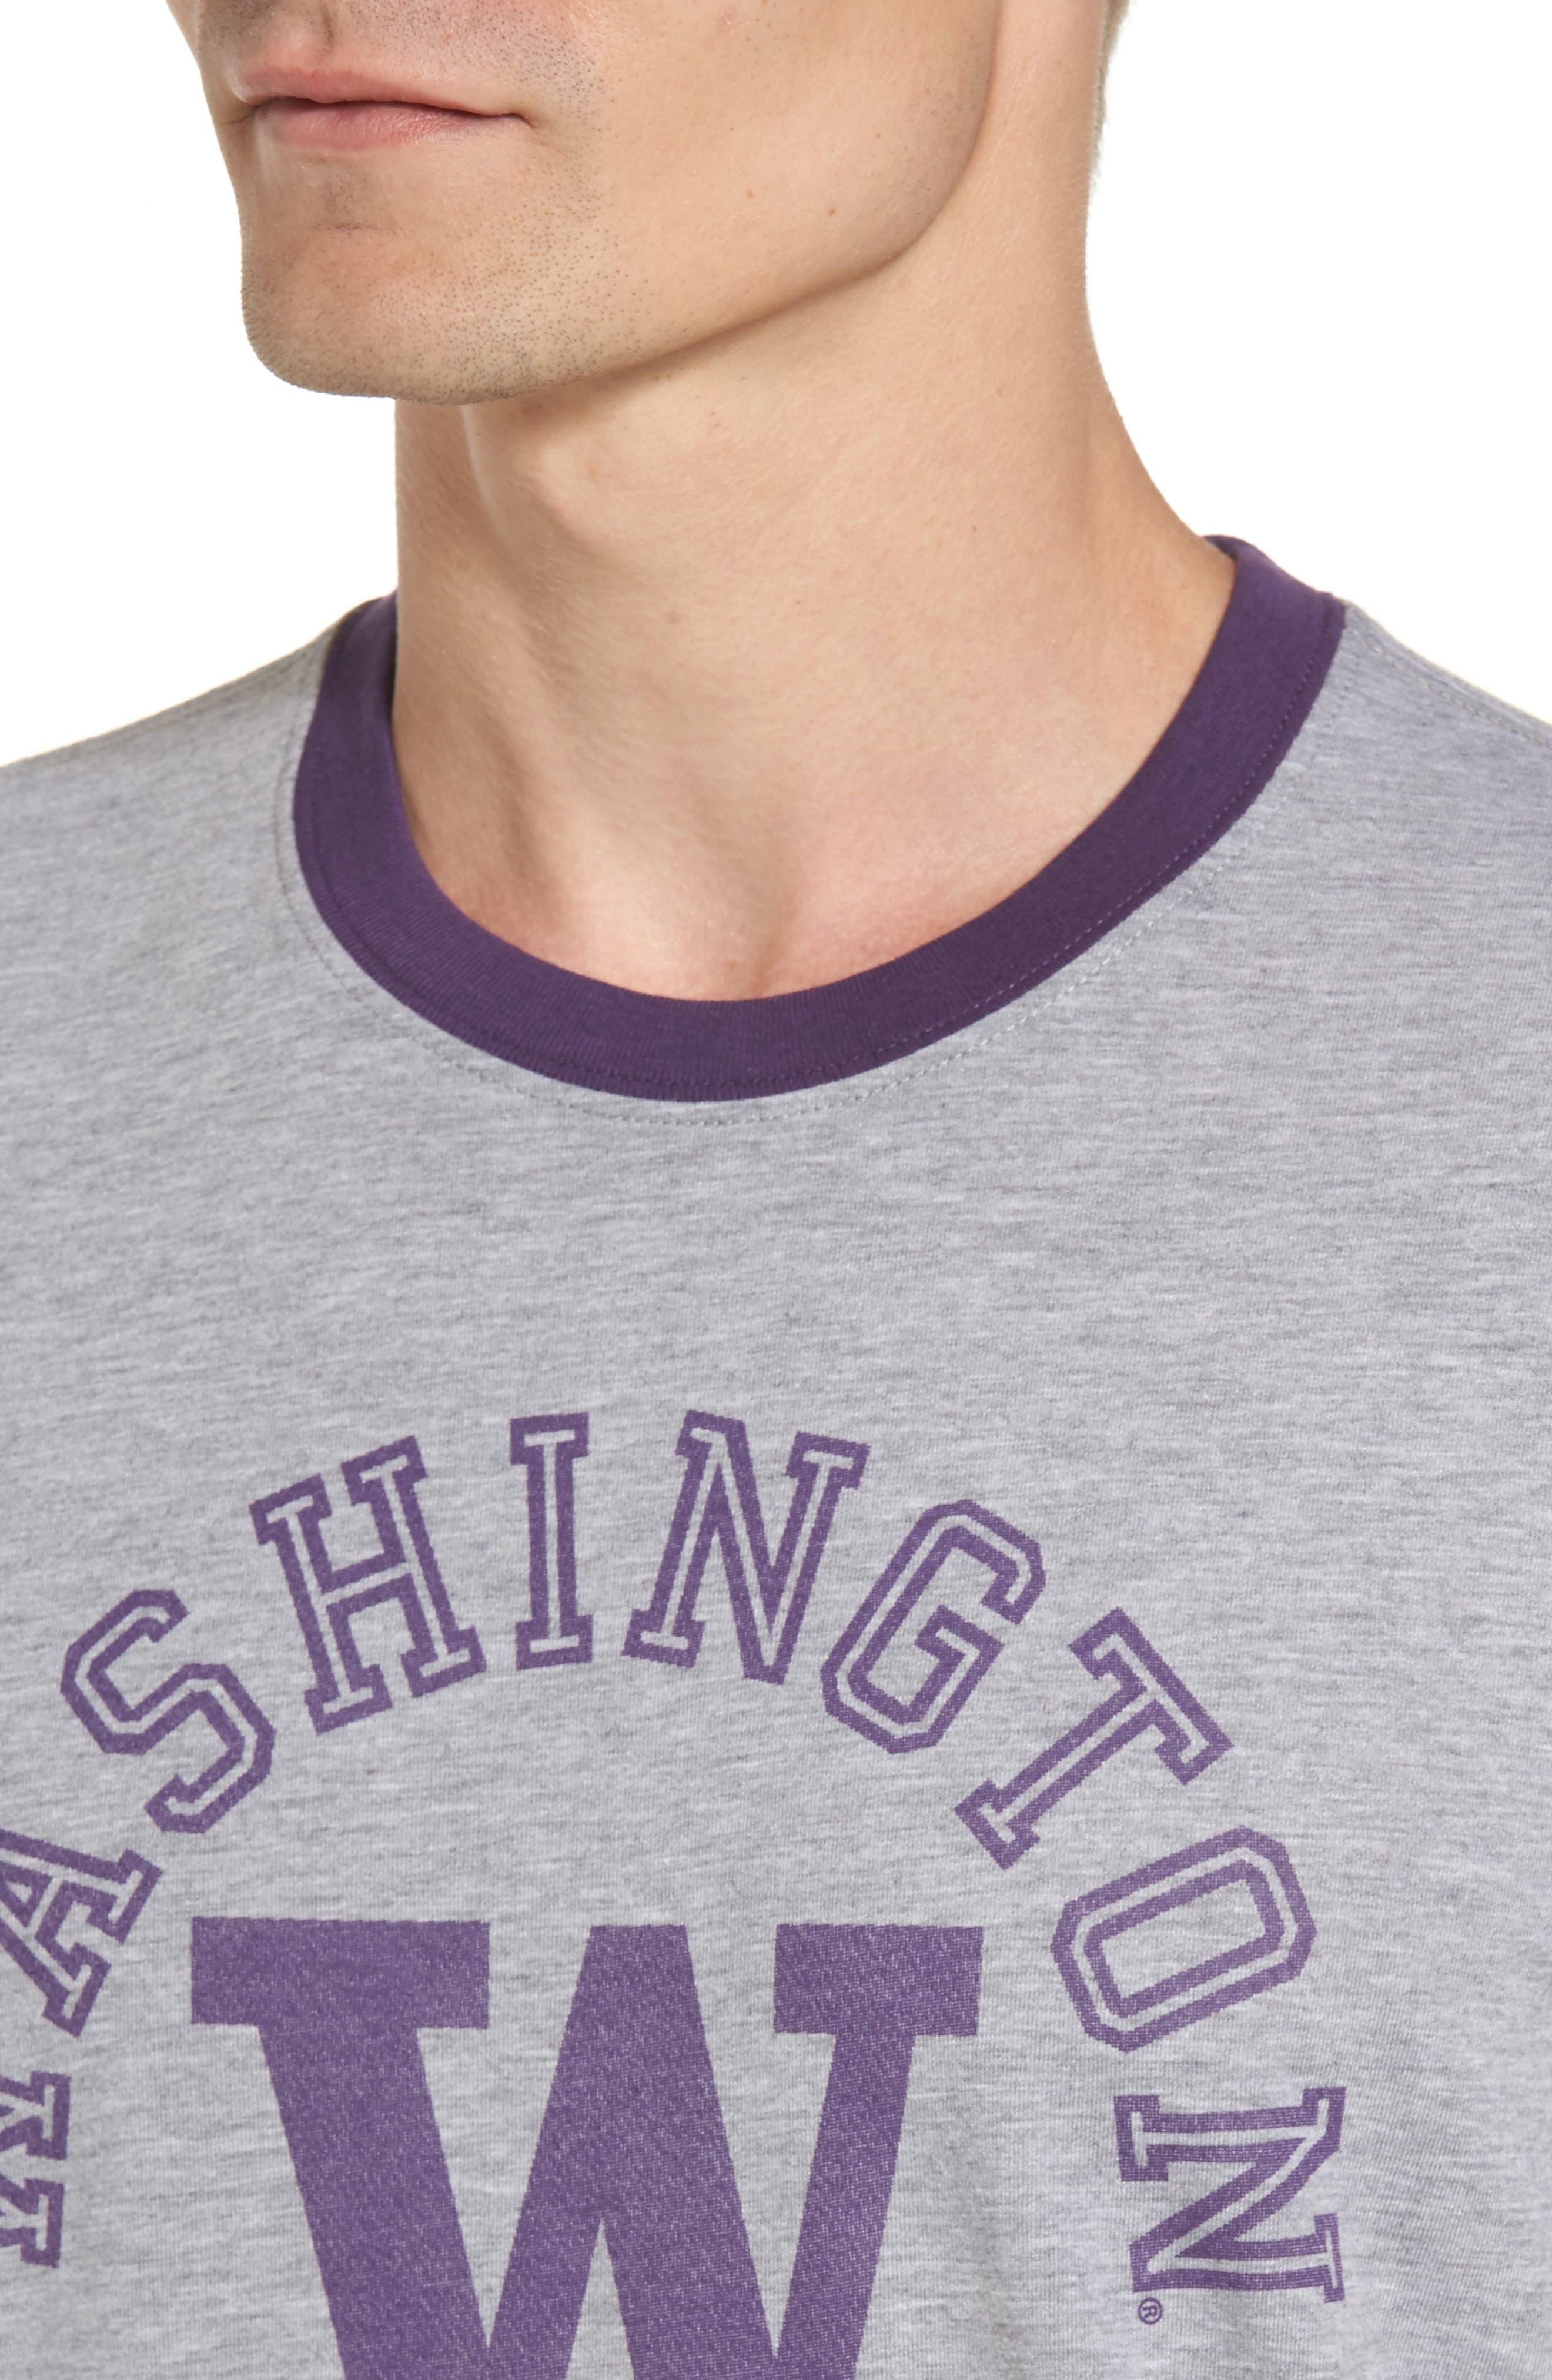 University of Washington Huskies Ringer T-Shirt,                             Alternate thumbnail 4, color,                             020